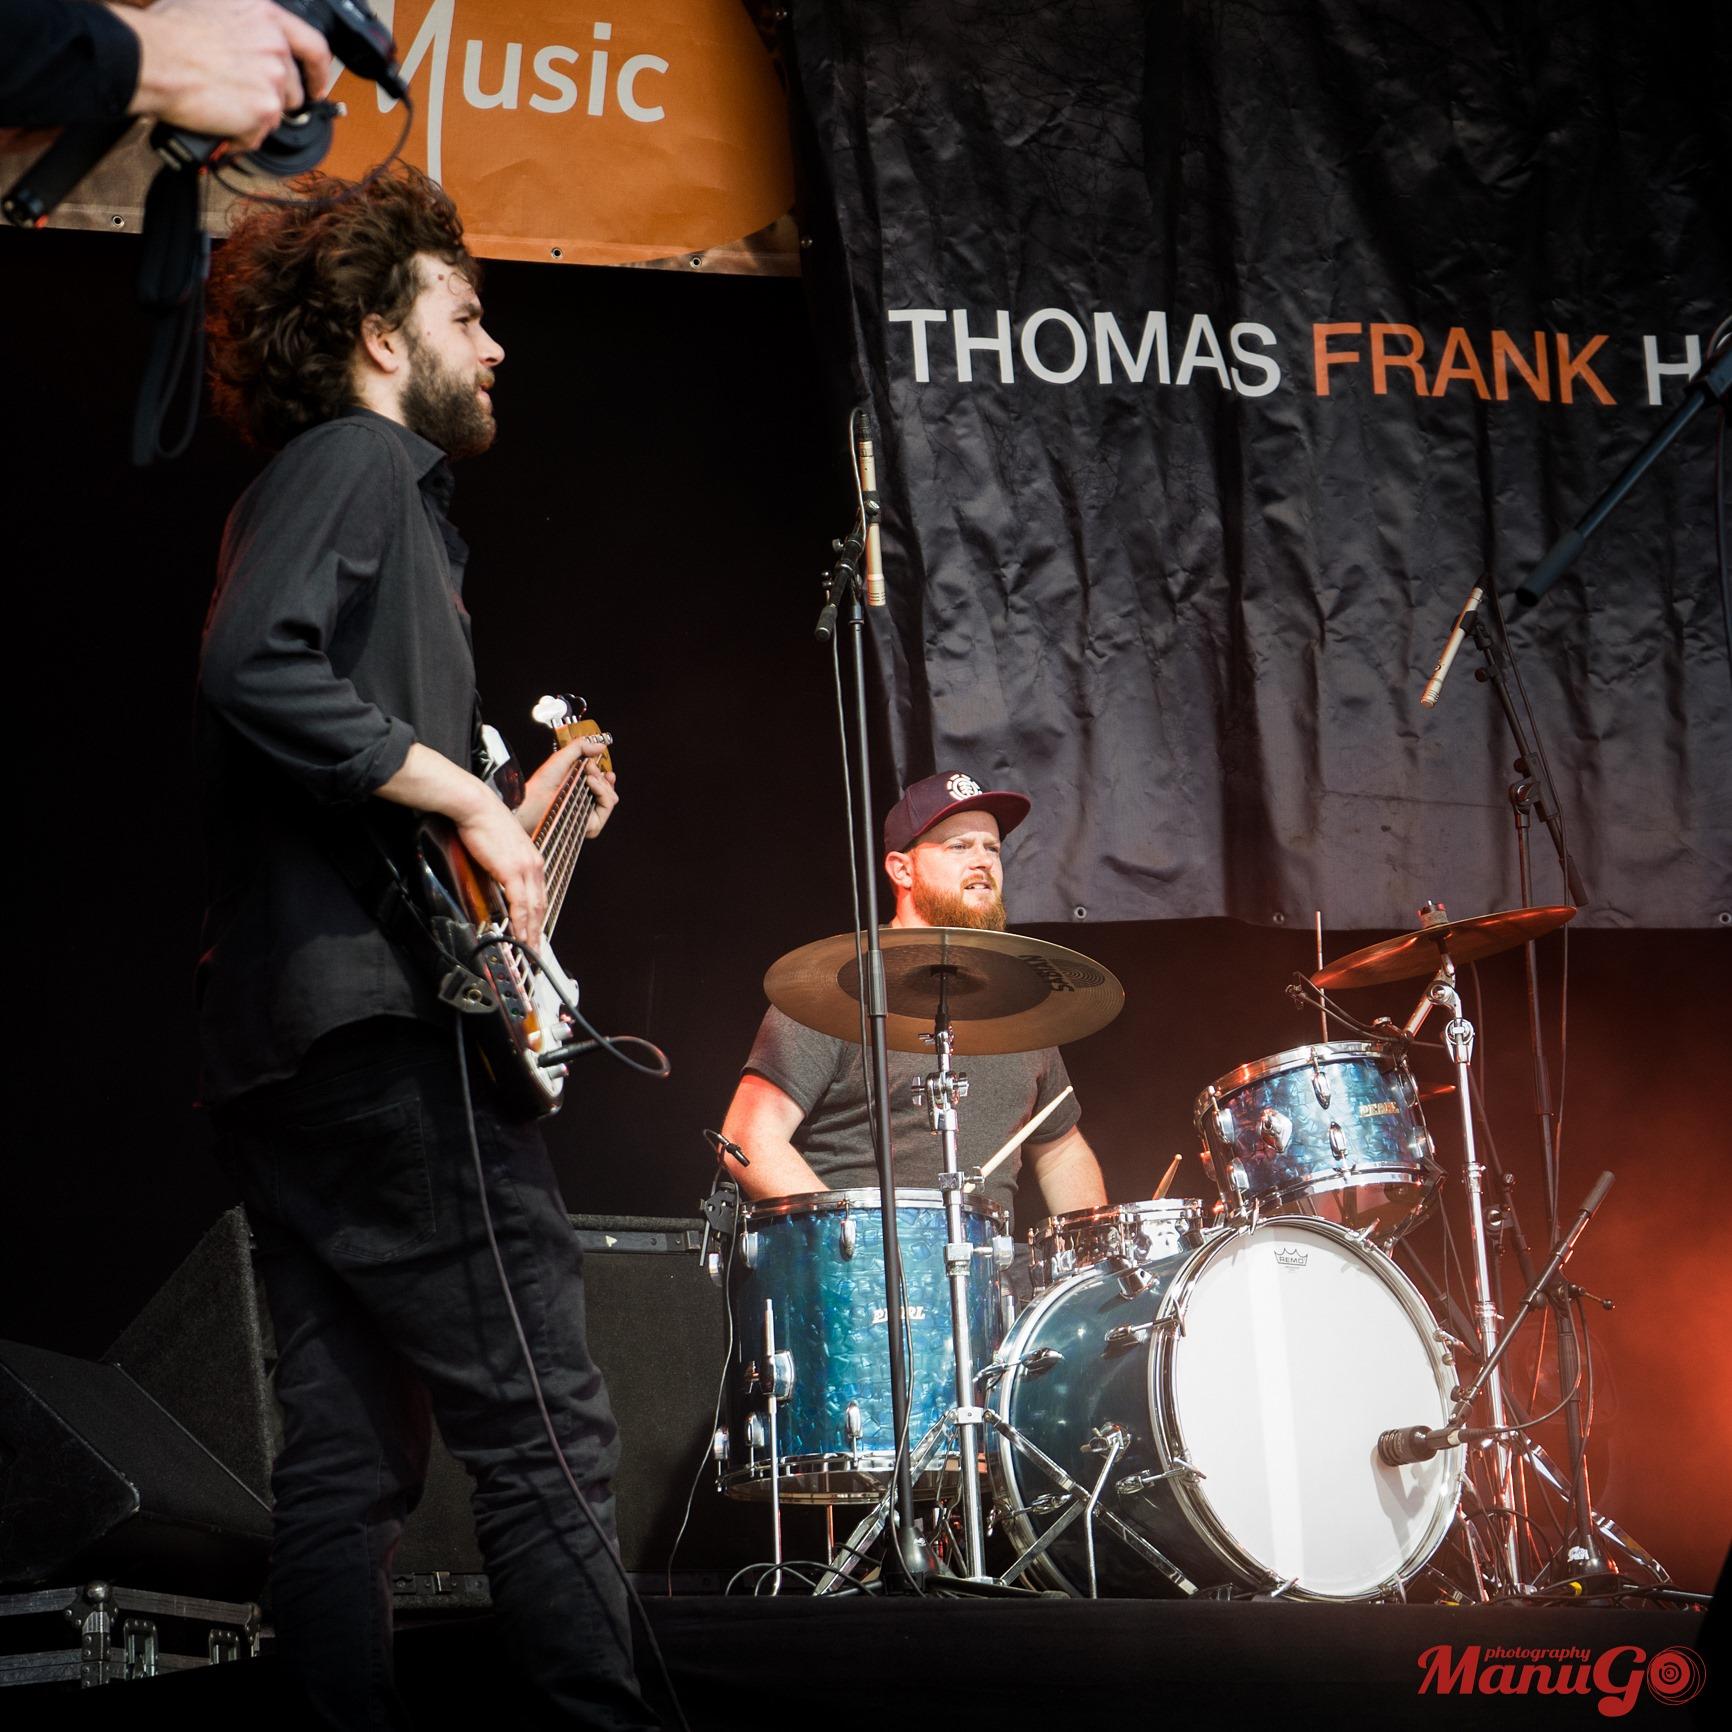 Thomas Frank Hopper